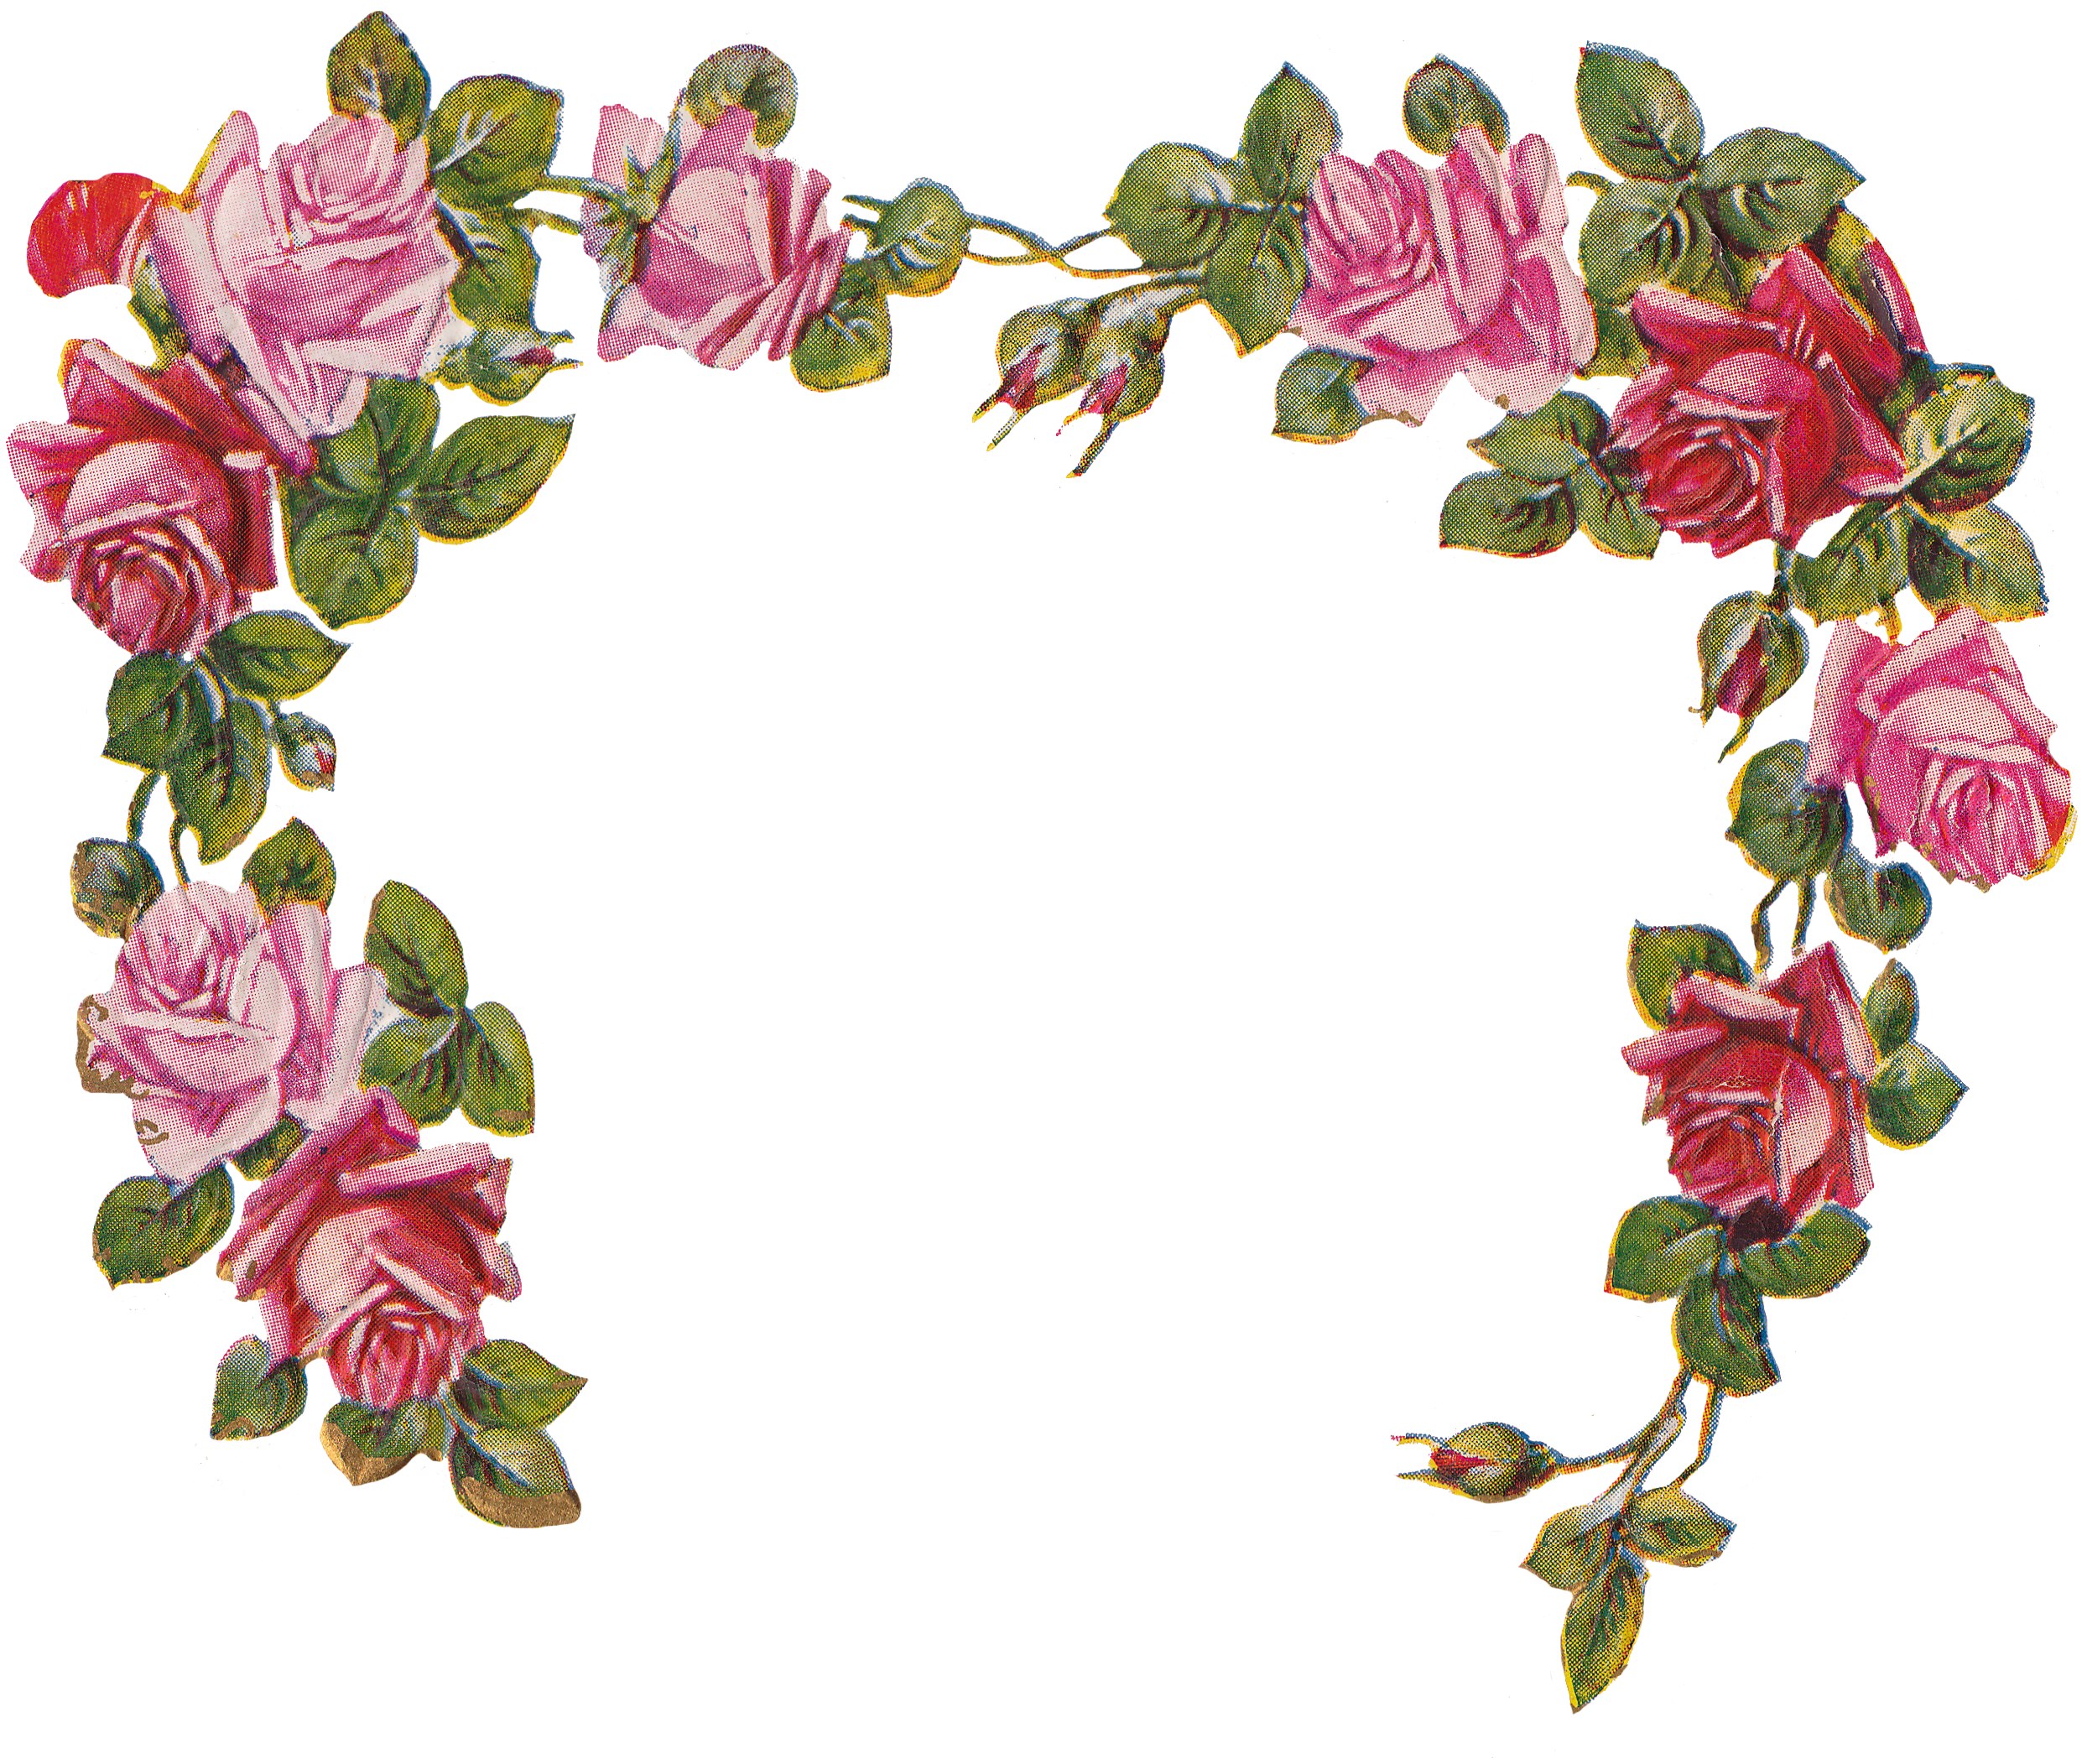 Garland clipart flower garland. Transparent background pinterest friend